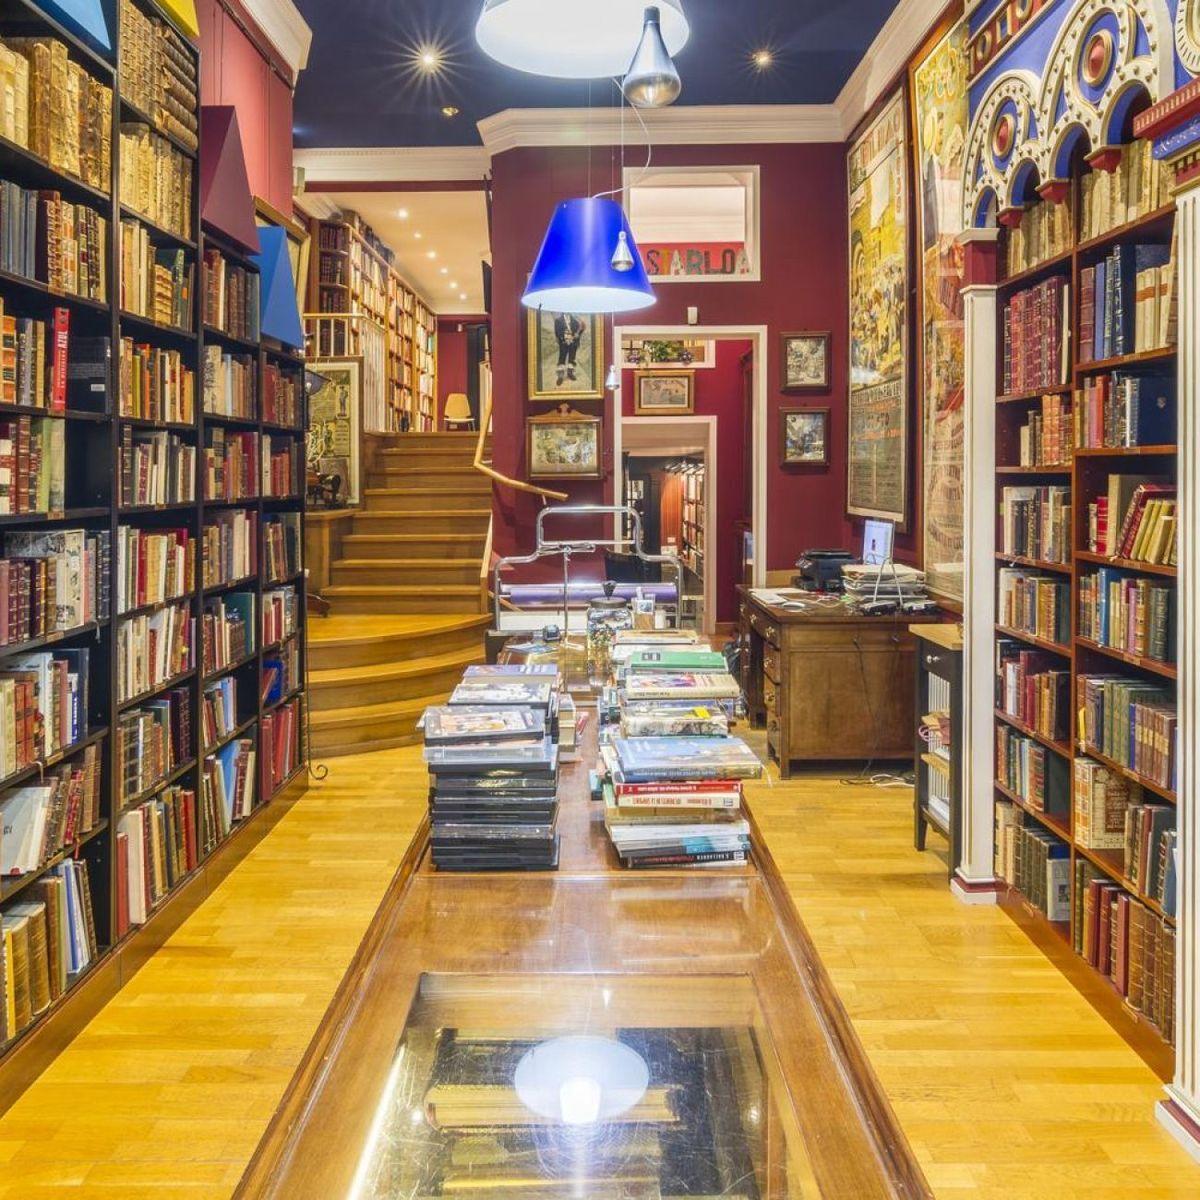 3548-libreria-anticuaria-astarloa-02